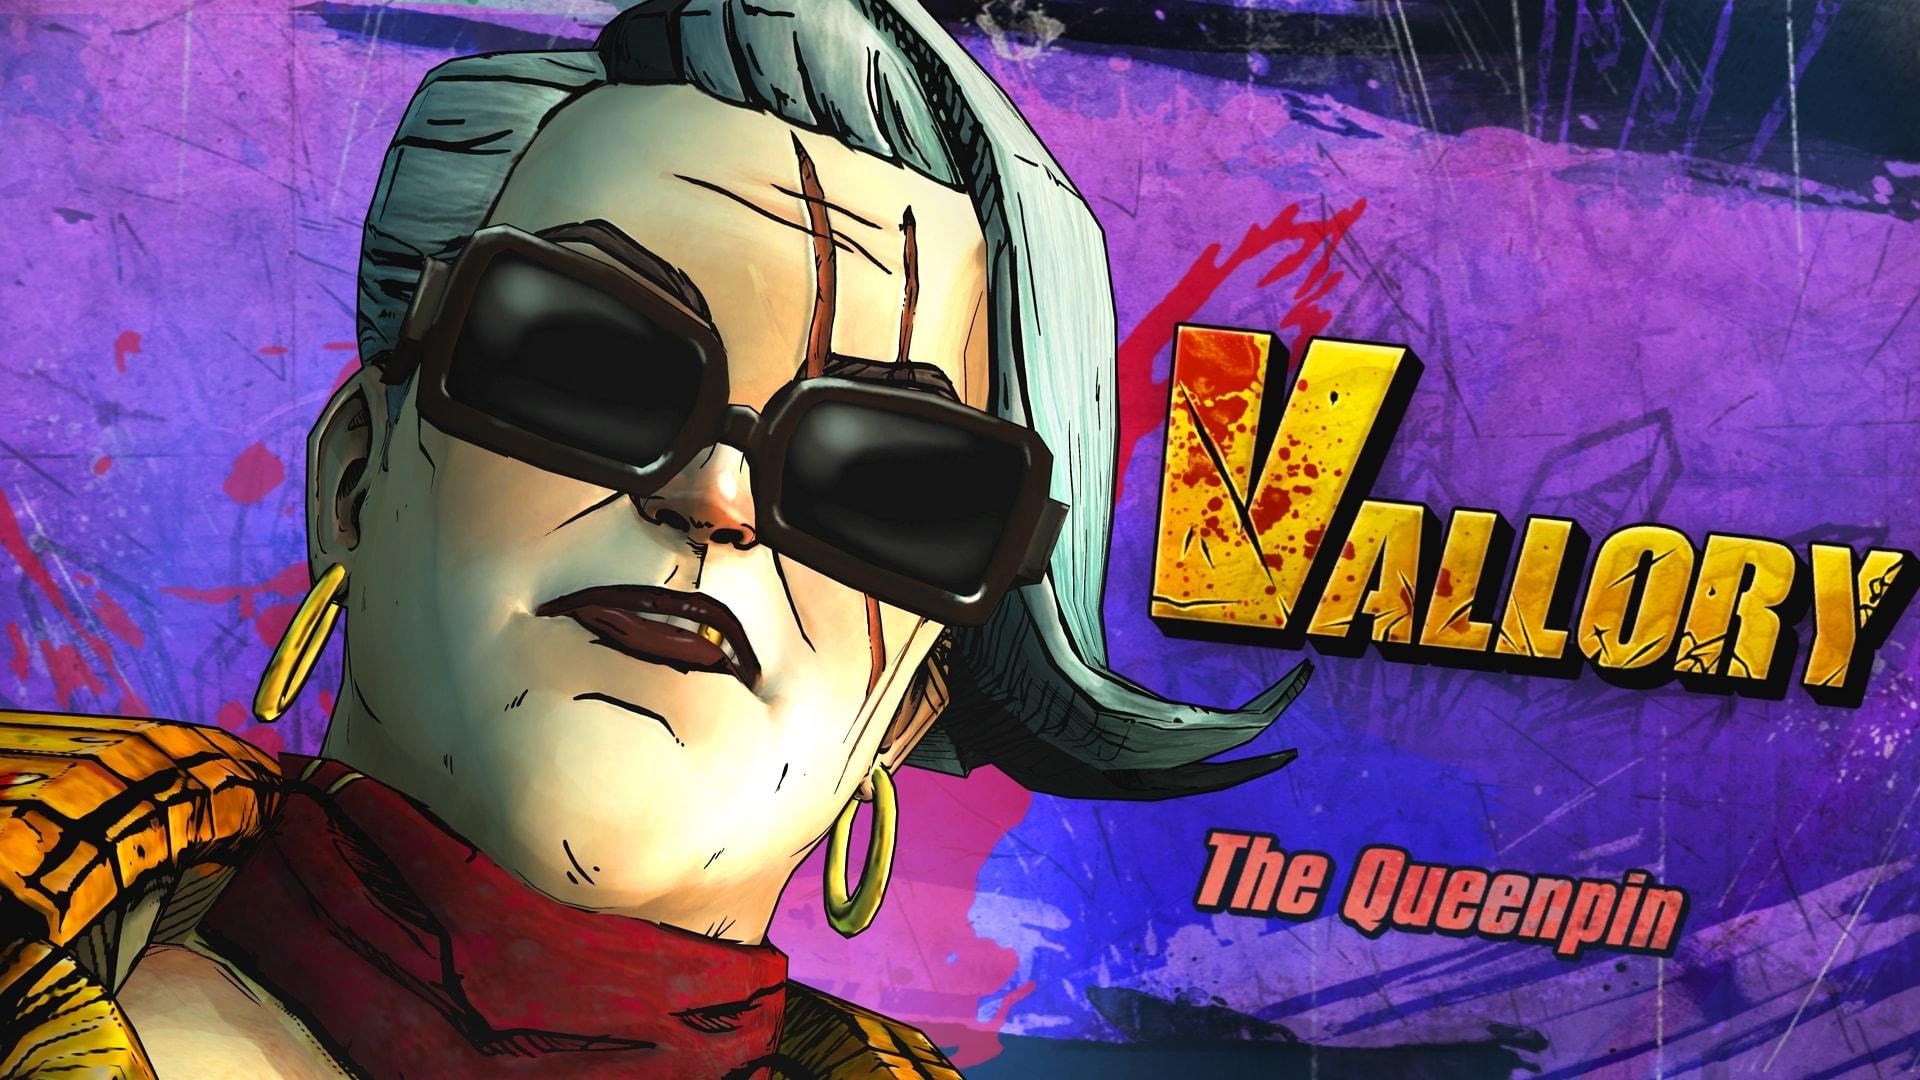 Tales from the Borderlands: Episode 5 - The Vault of the Traveler Desktop wallpaper